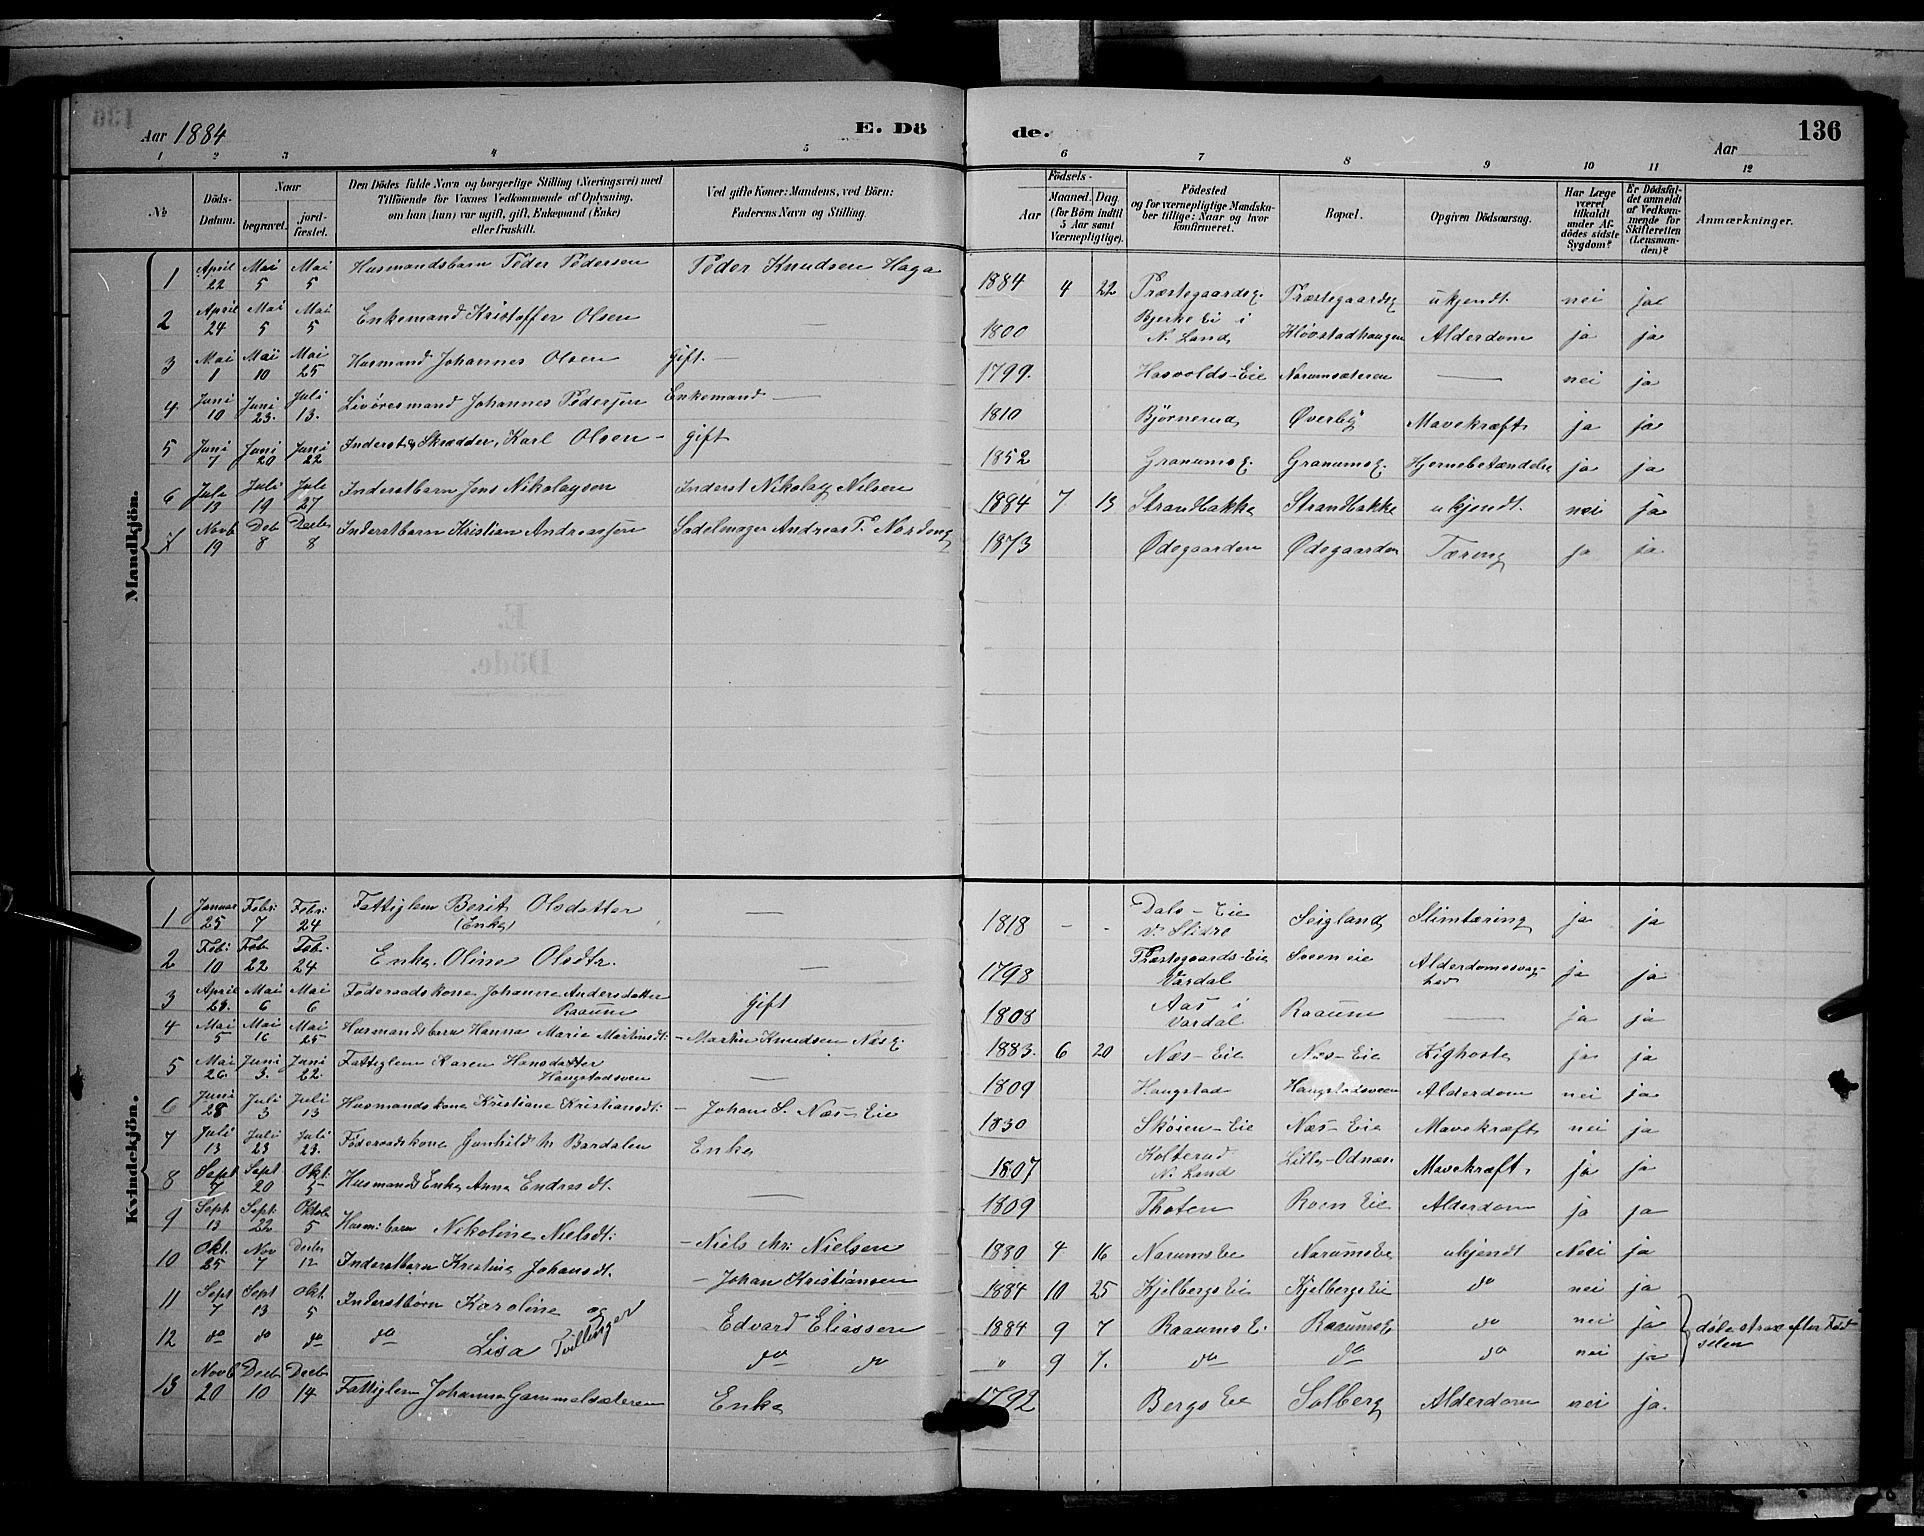 SAH, Søndre Land prestekontor, L/L0003: Klokkerbok nr. 3, 1884-1902, s. 136